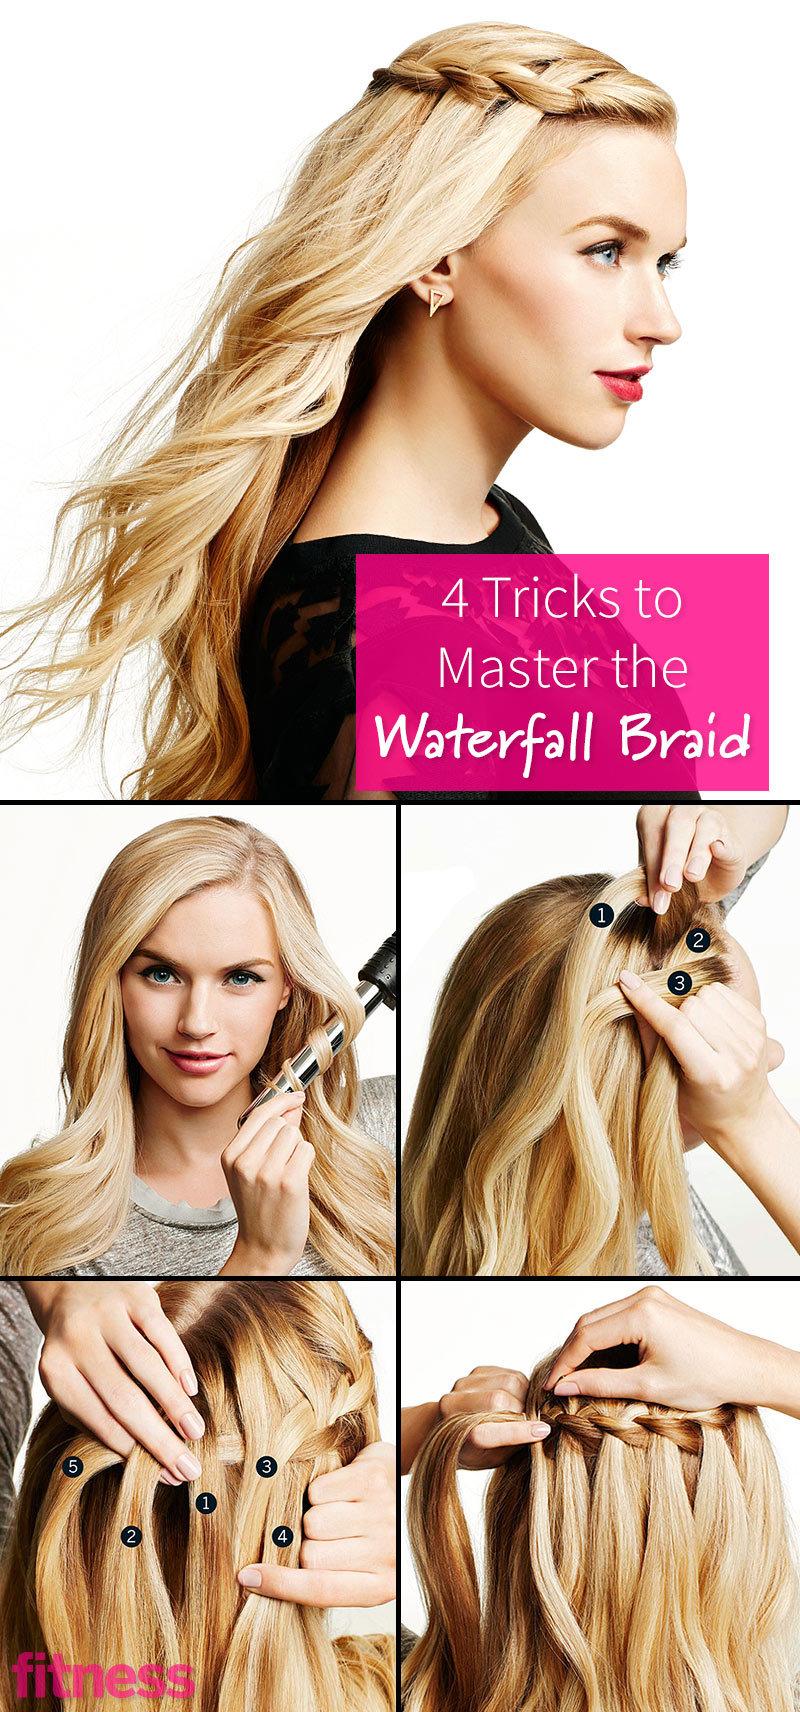 Waterfall Braid Tutorial How To Make A Waterfall Braid